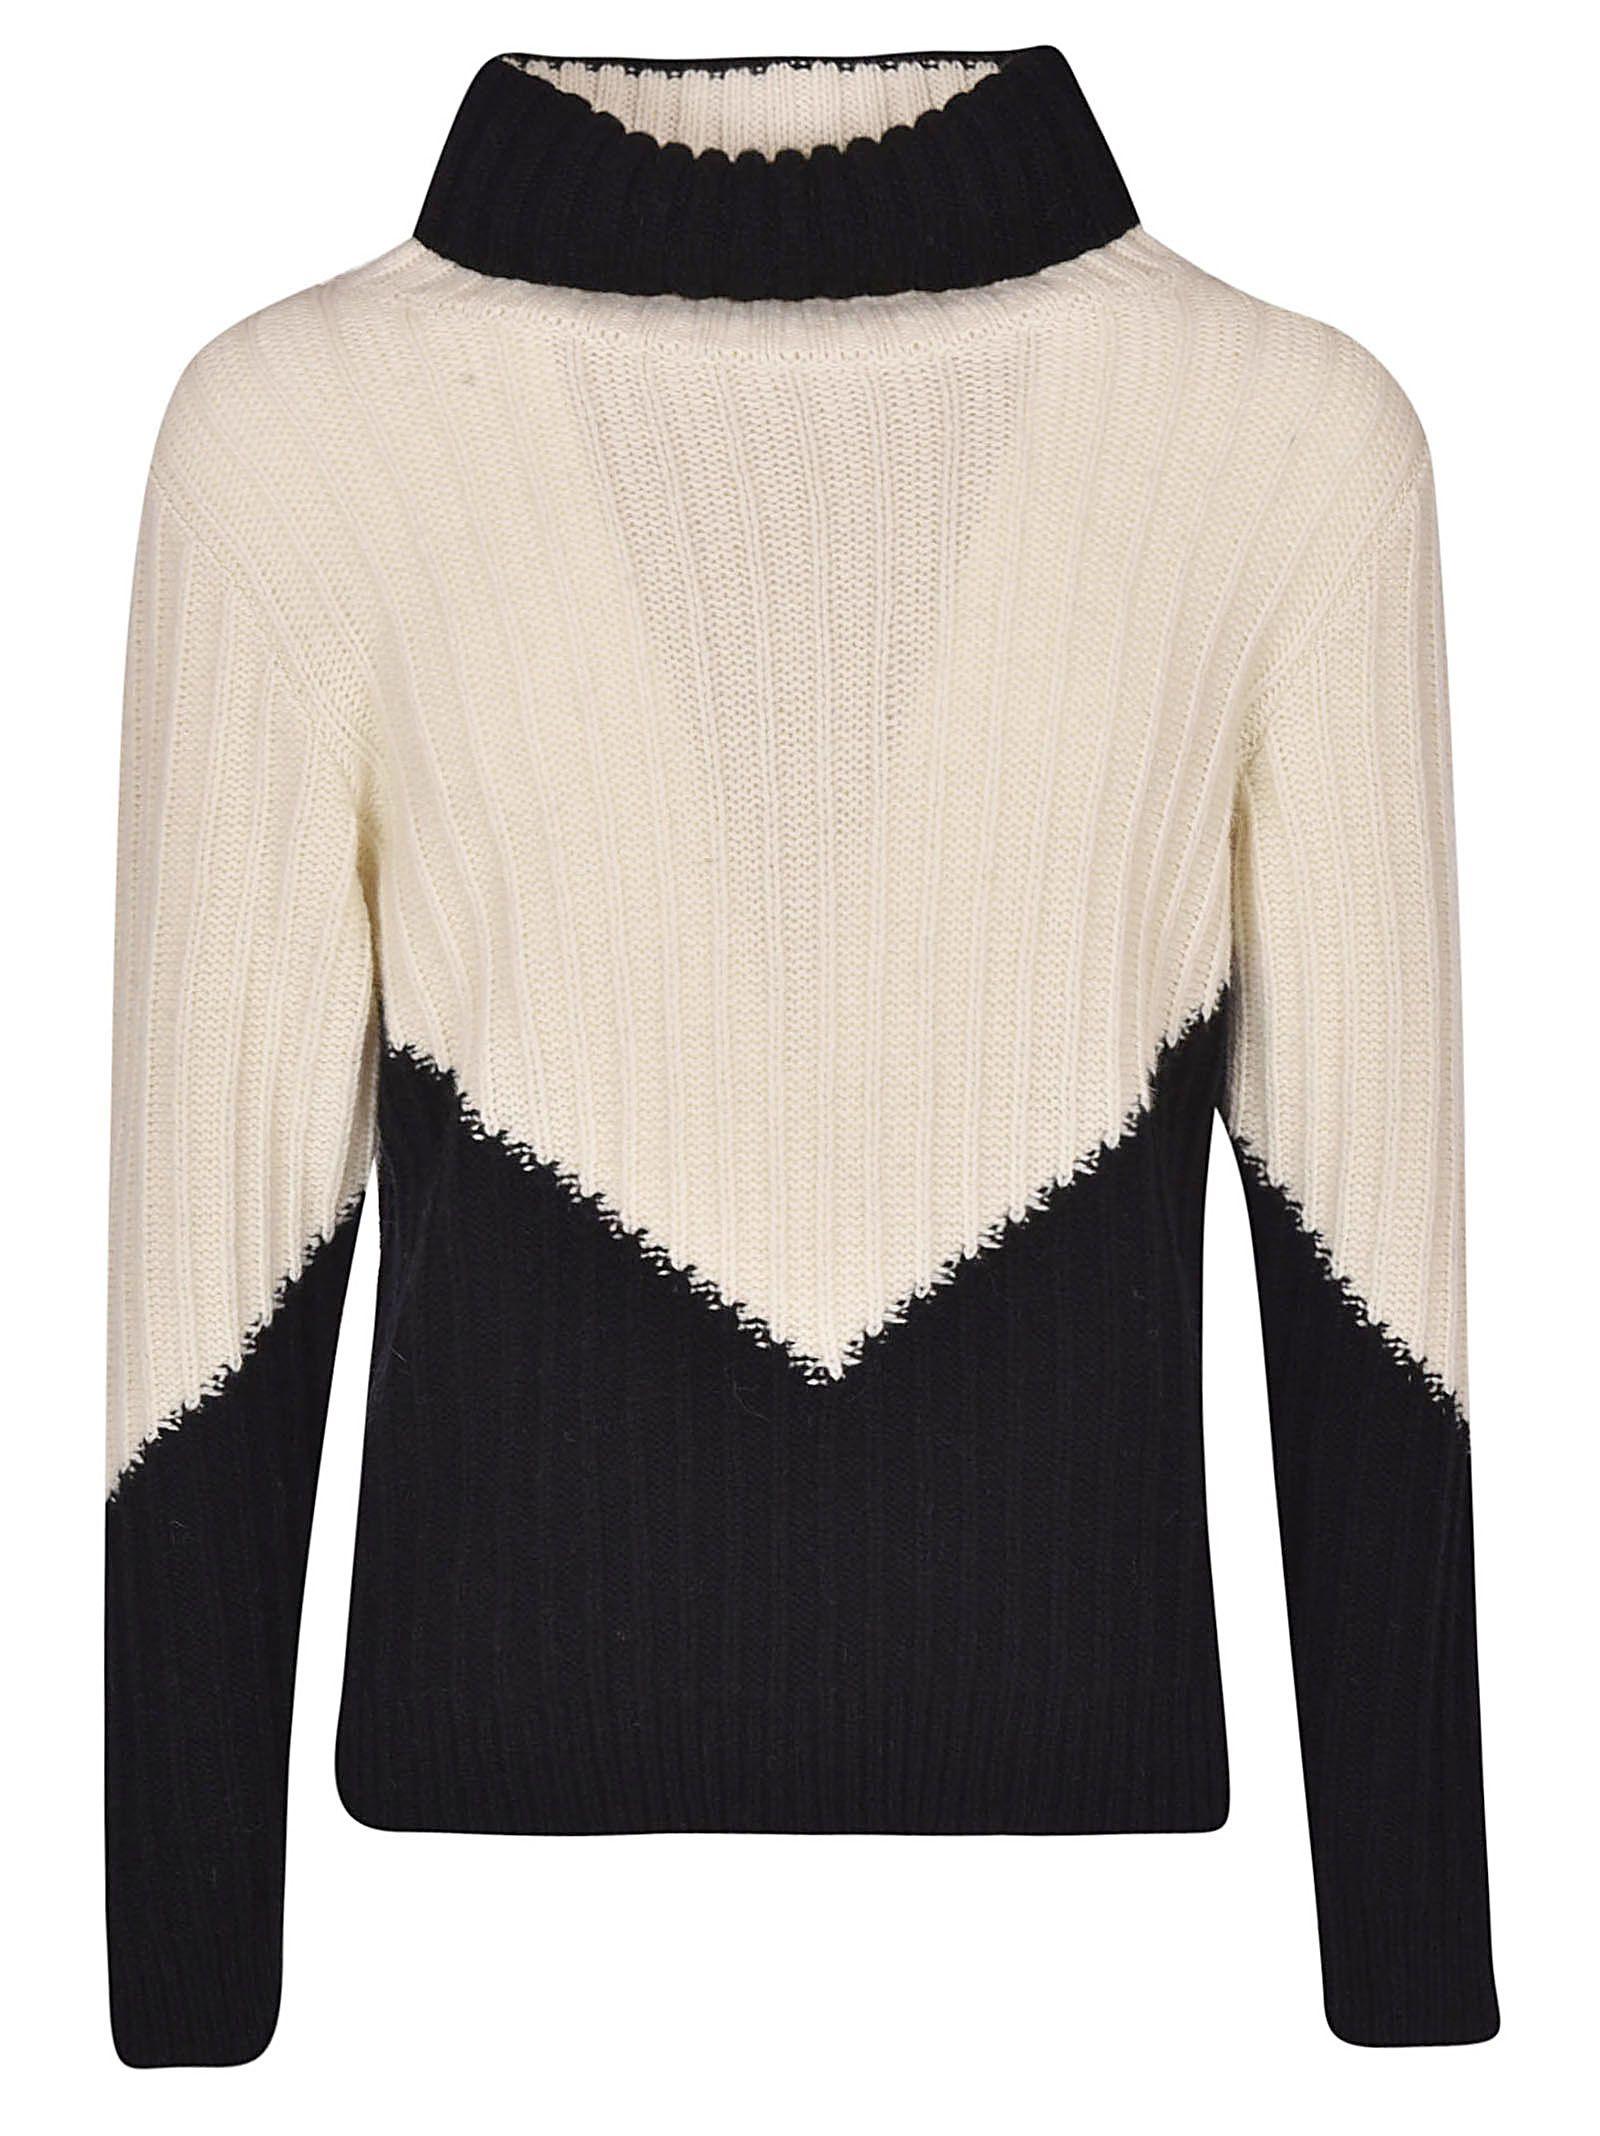 MASSIMO PIOMBO Turtleneck Sweater in 1-11